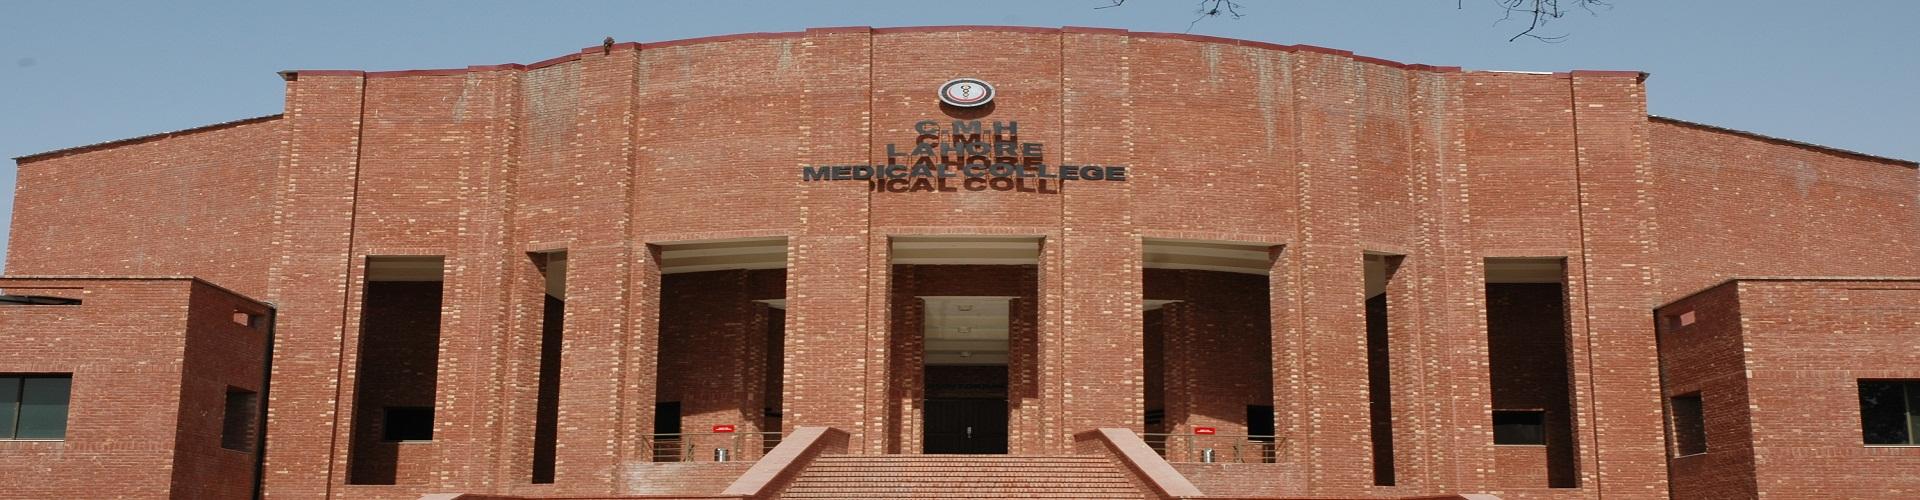 Cmh college